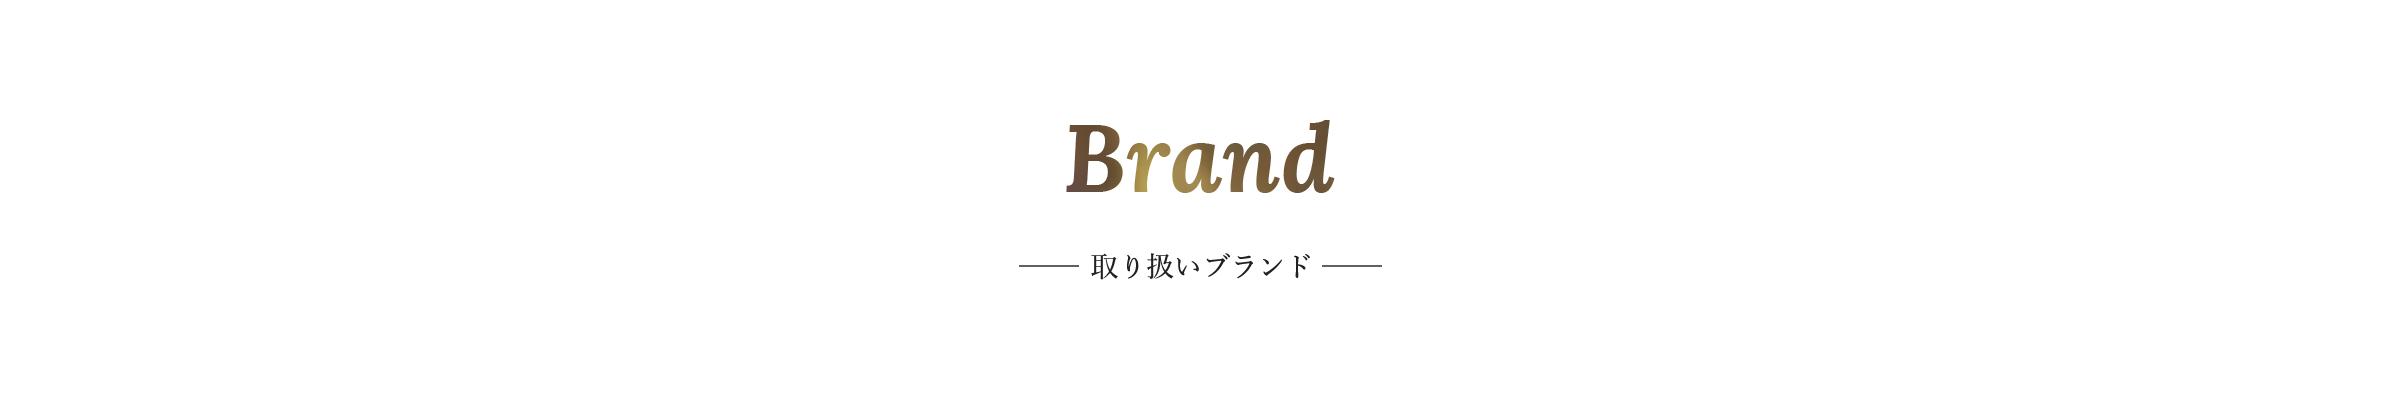 Brand-取り扱いブランド-